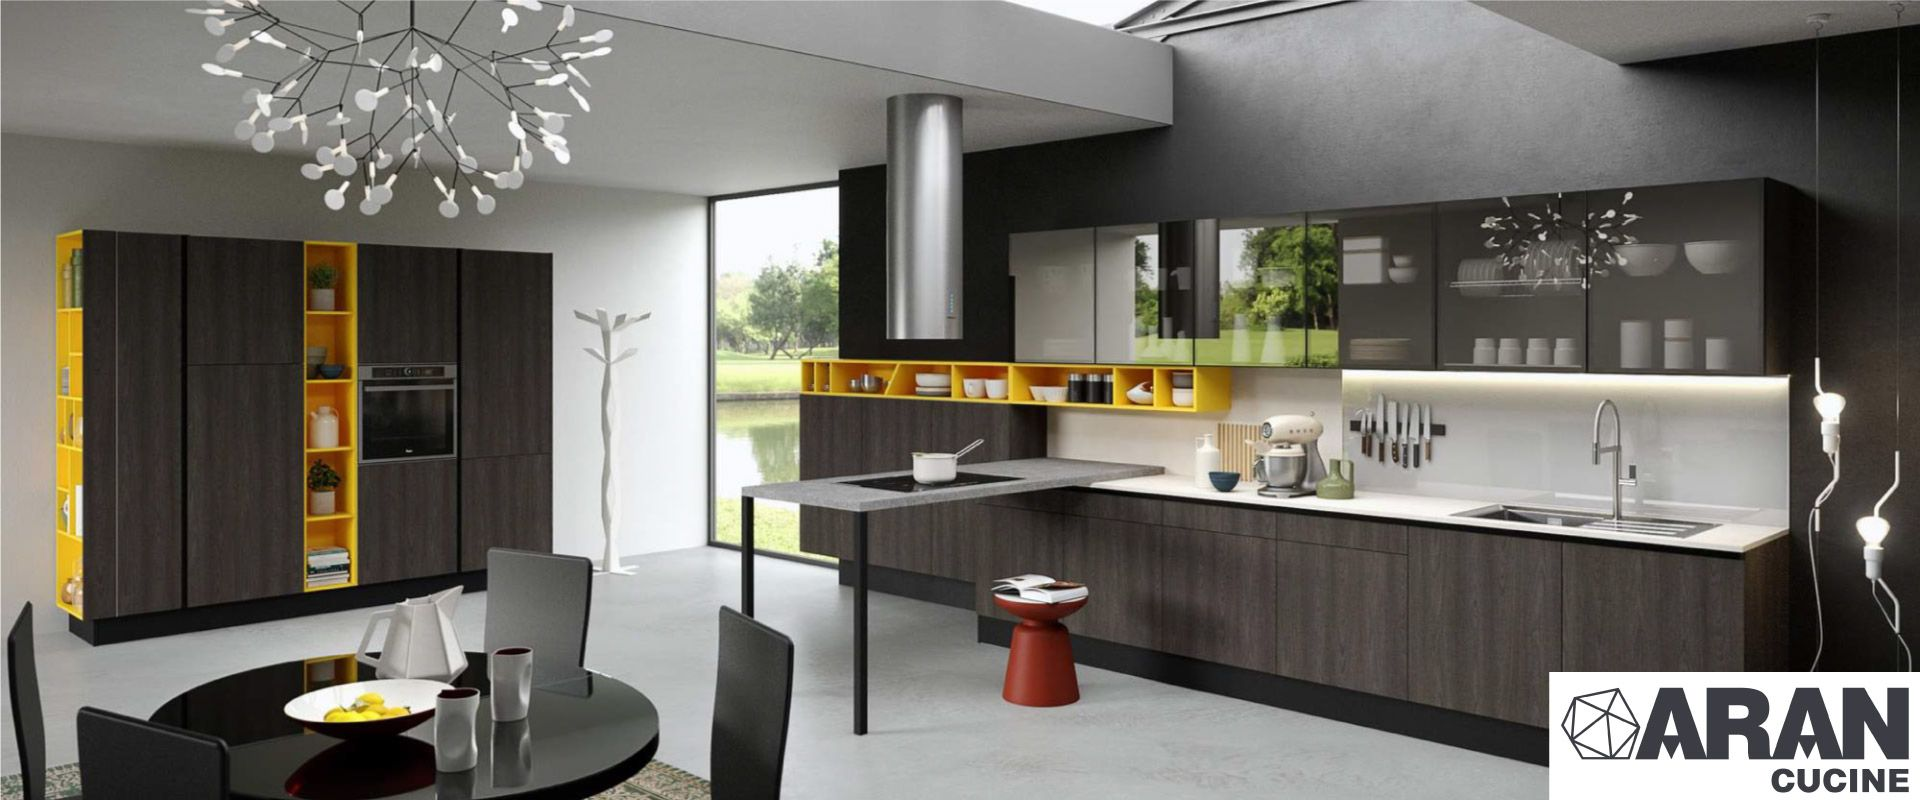 10 Cucina Aran Mod Quadro Casa Trasacco Italia Our